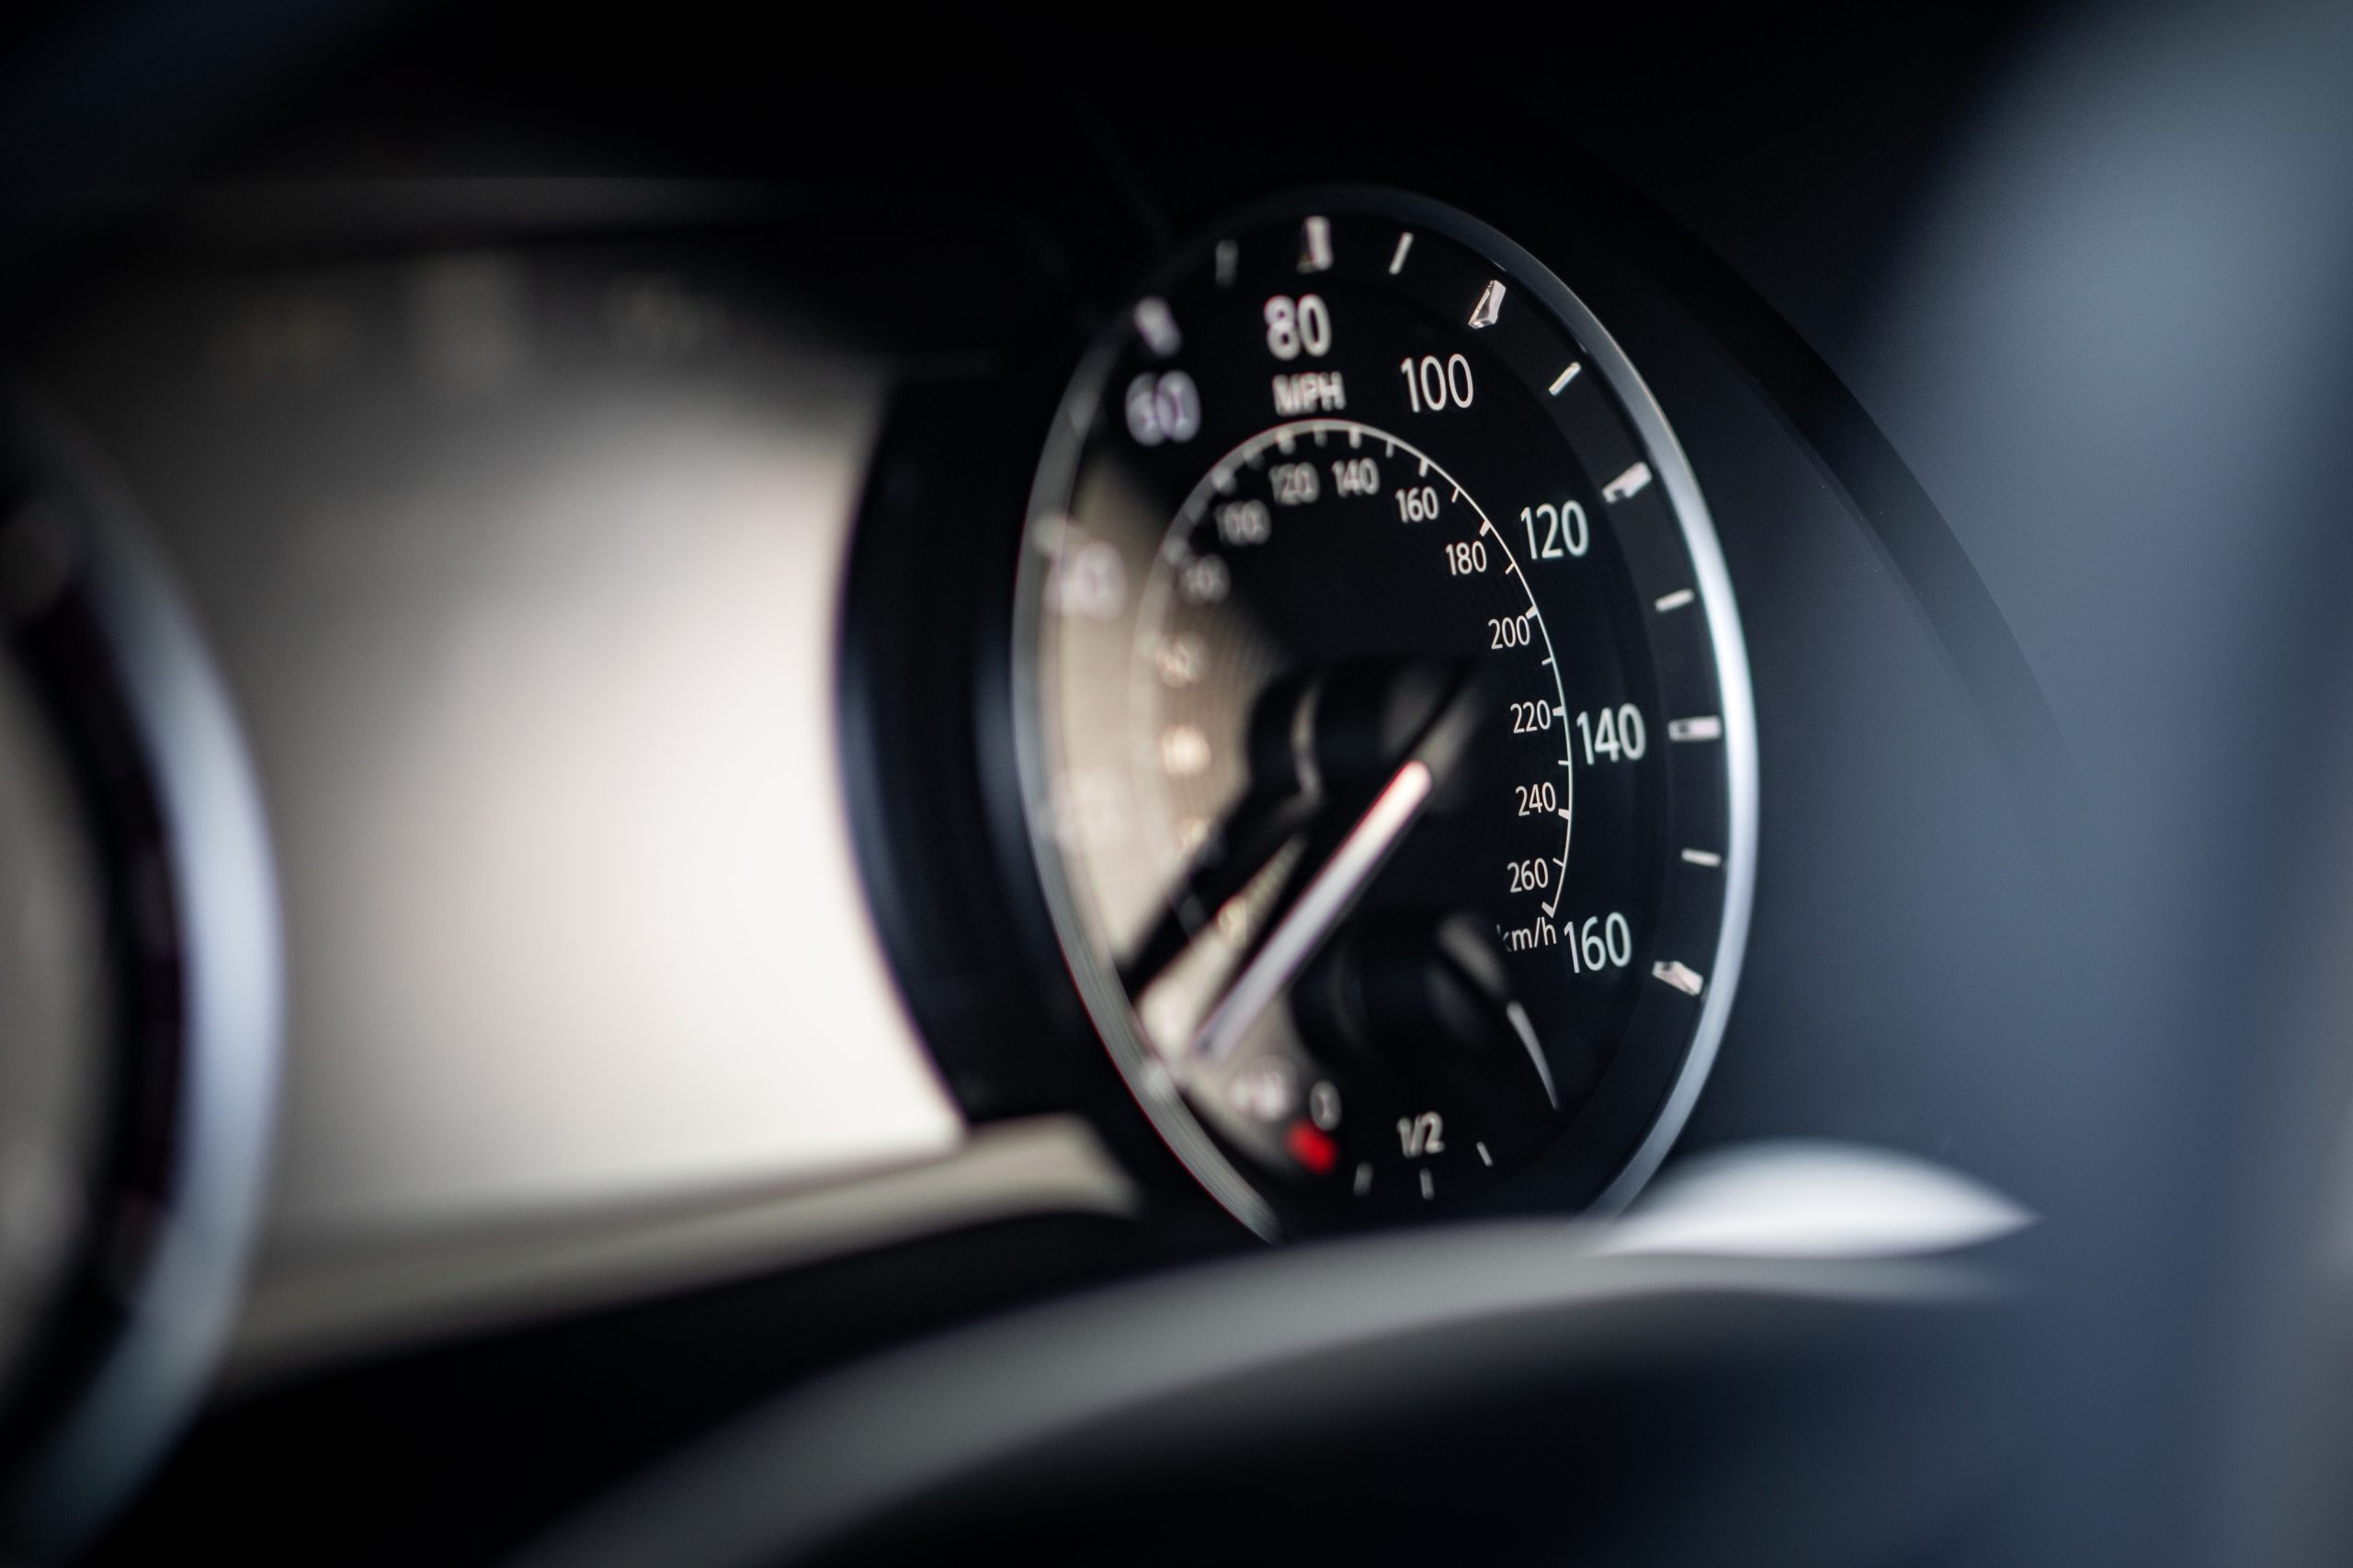 2022 Infiniti QX55 speedometer instrument cluster